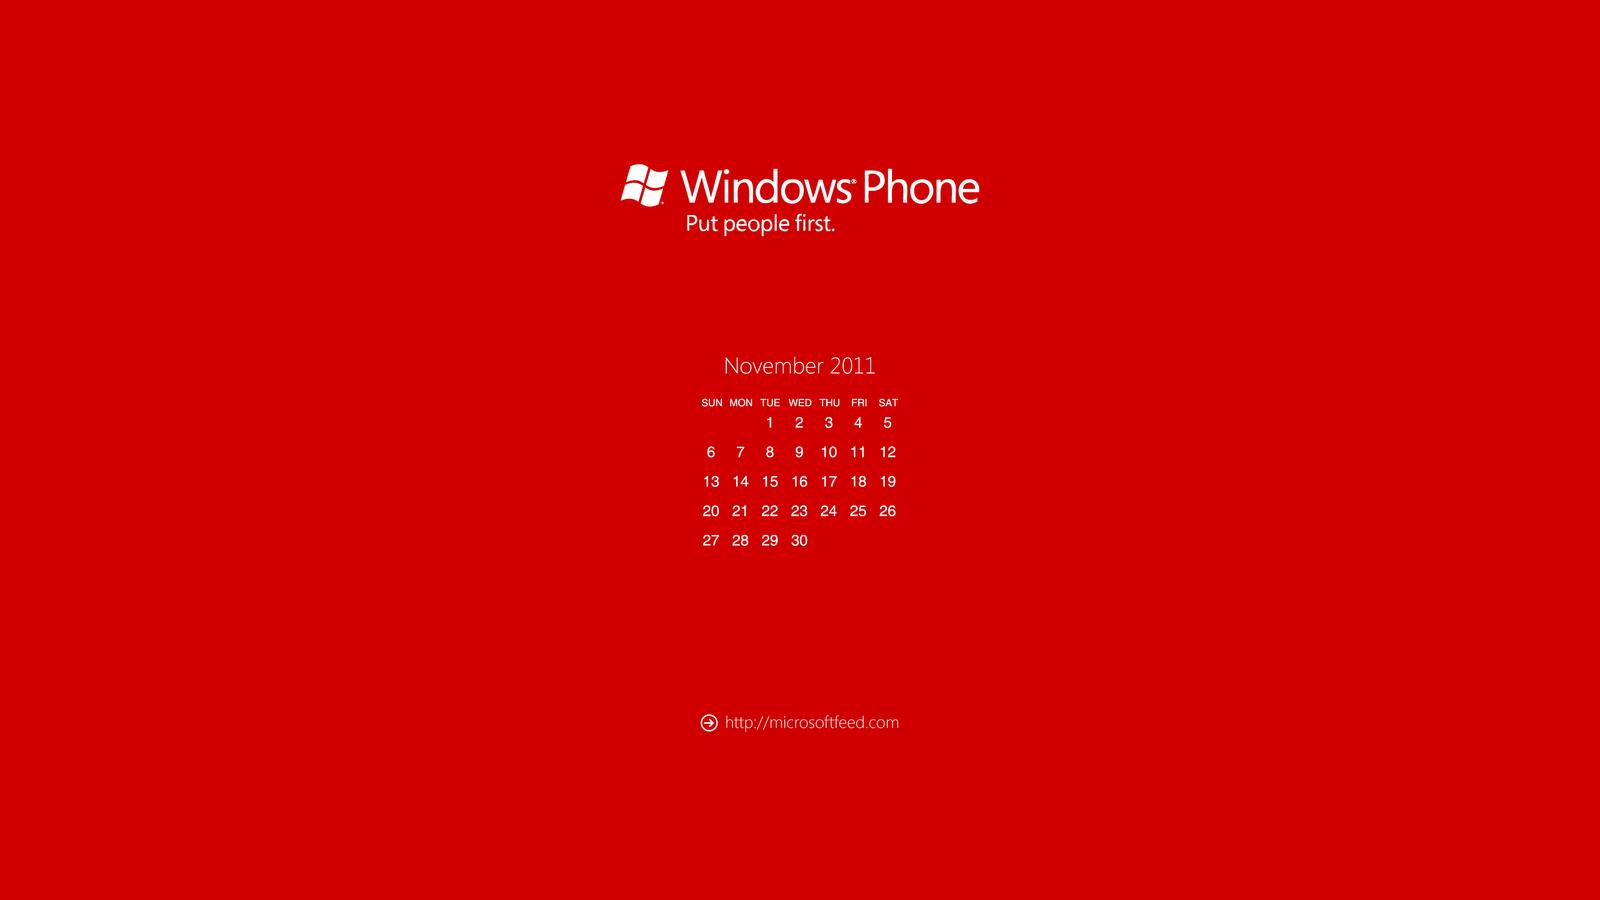 http://1.bp.blogspot.com/-bsFQt8XkaGI/TrR5F3-n1PI/AAAAAAAABpg/xczFp9t37bc/s1600/Windows-Phone-Metro-Style-Desktop-Wallpaper-Calendar-November-2011.png